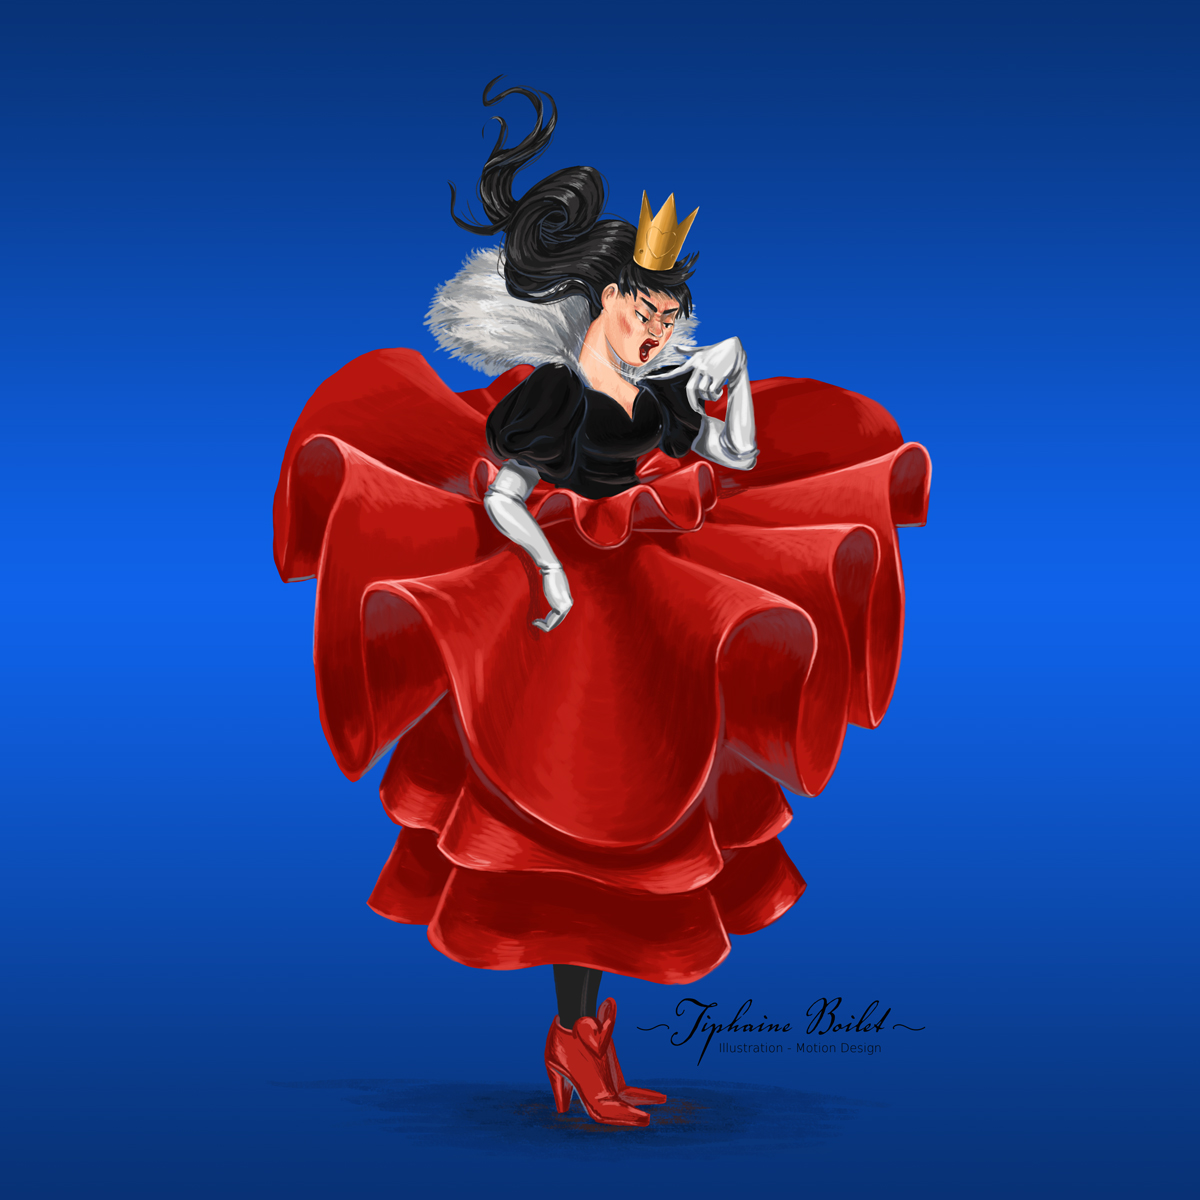 illustration digitale Tiphaine Boilet illustratrice freelance Nantes Alice au pays des merveilles illustration